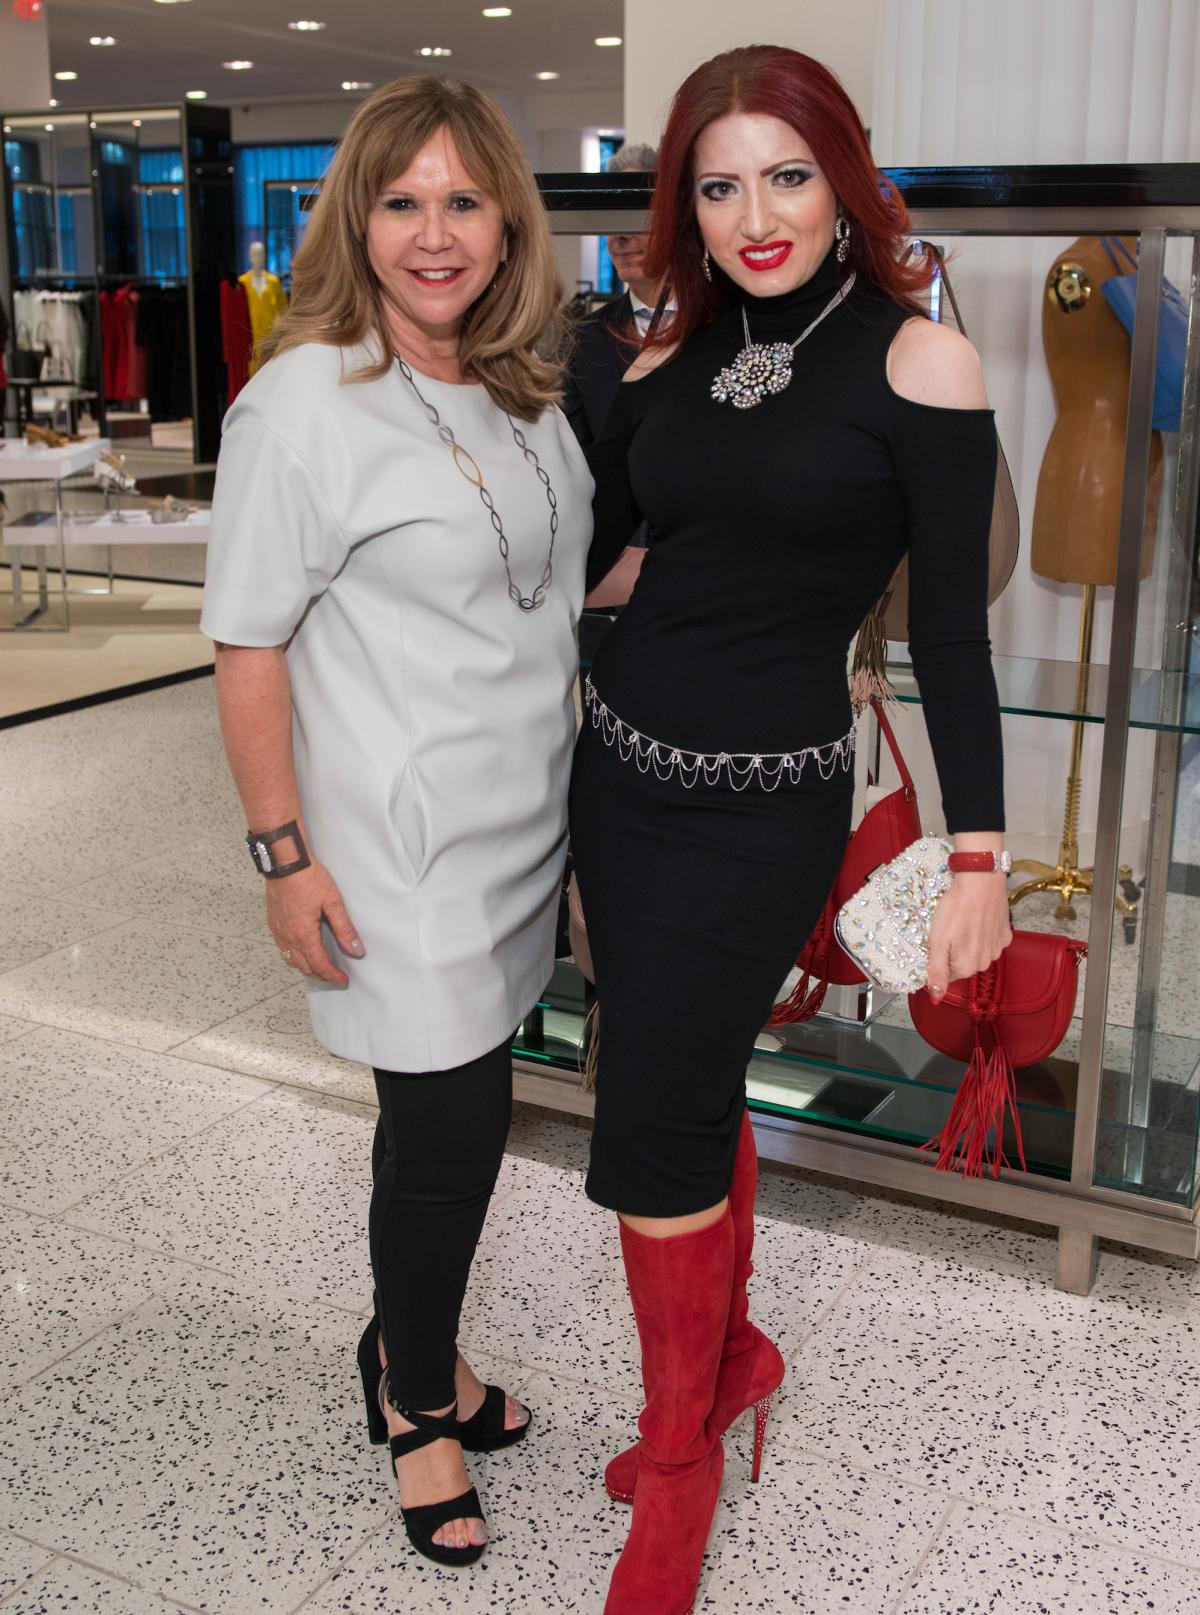 Houston, Latin Women's Initiative Fashion Show and Luncheon, feb 2017, Cyndy Garza Roberts, Yasmine Haddad